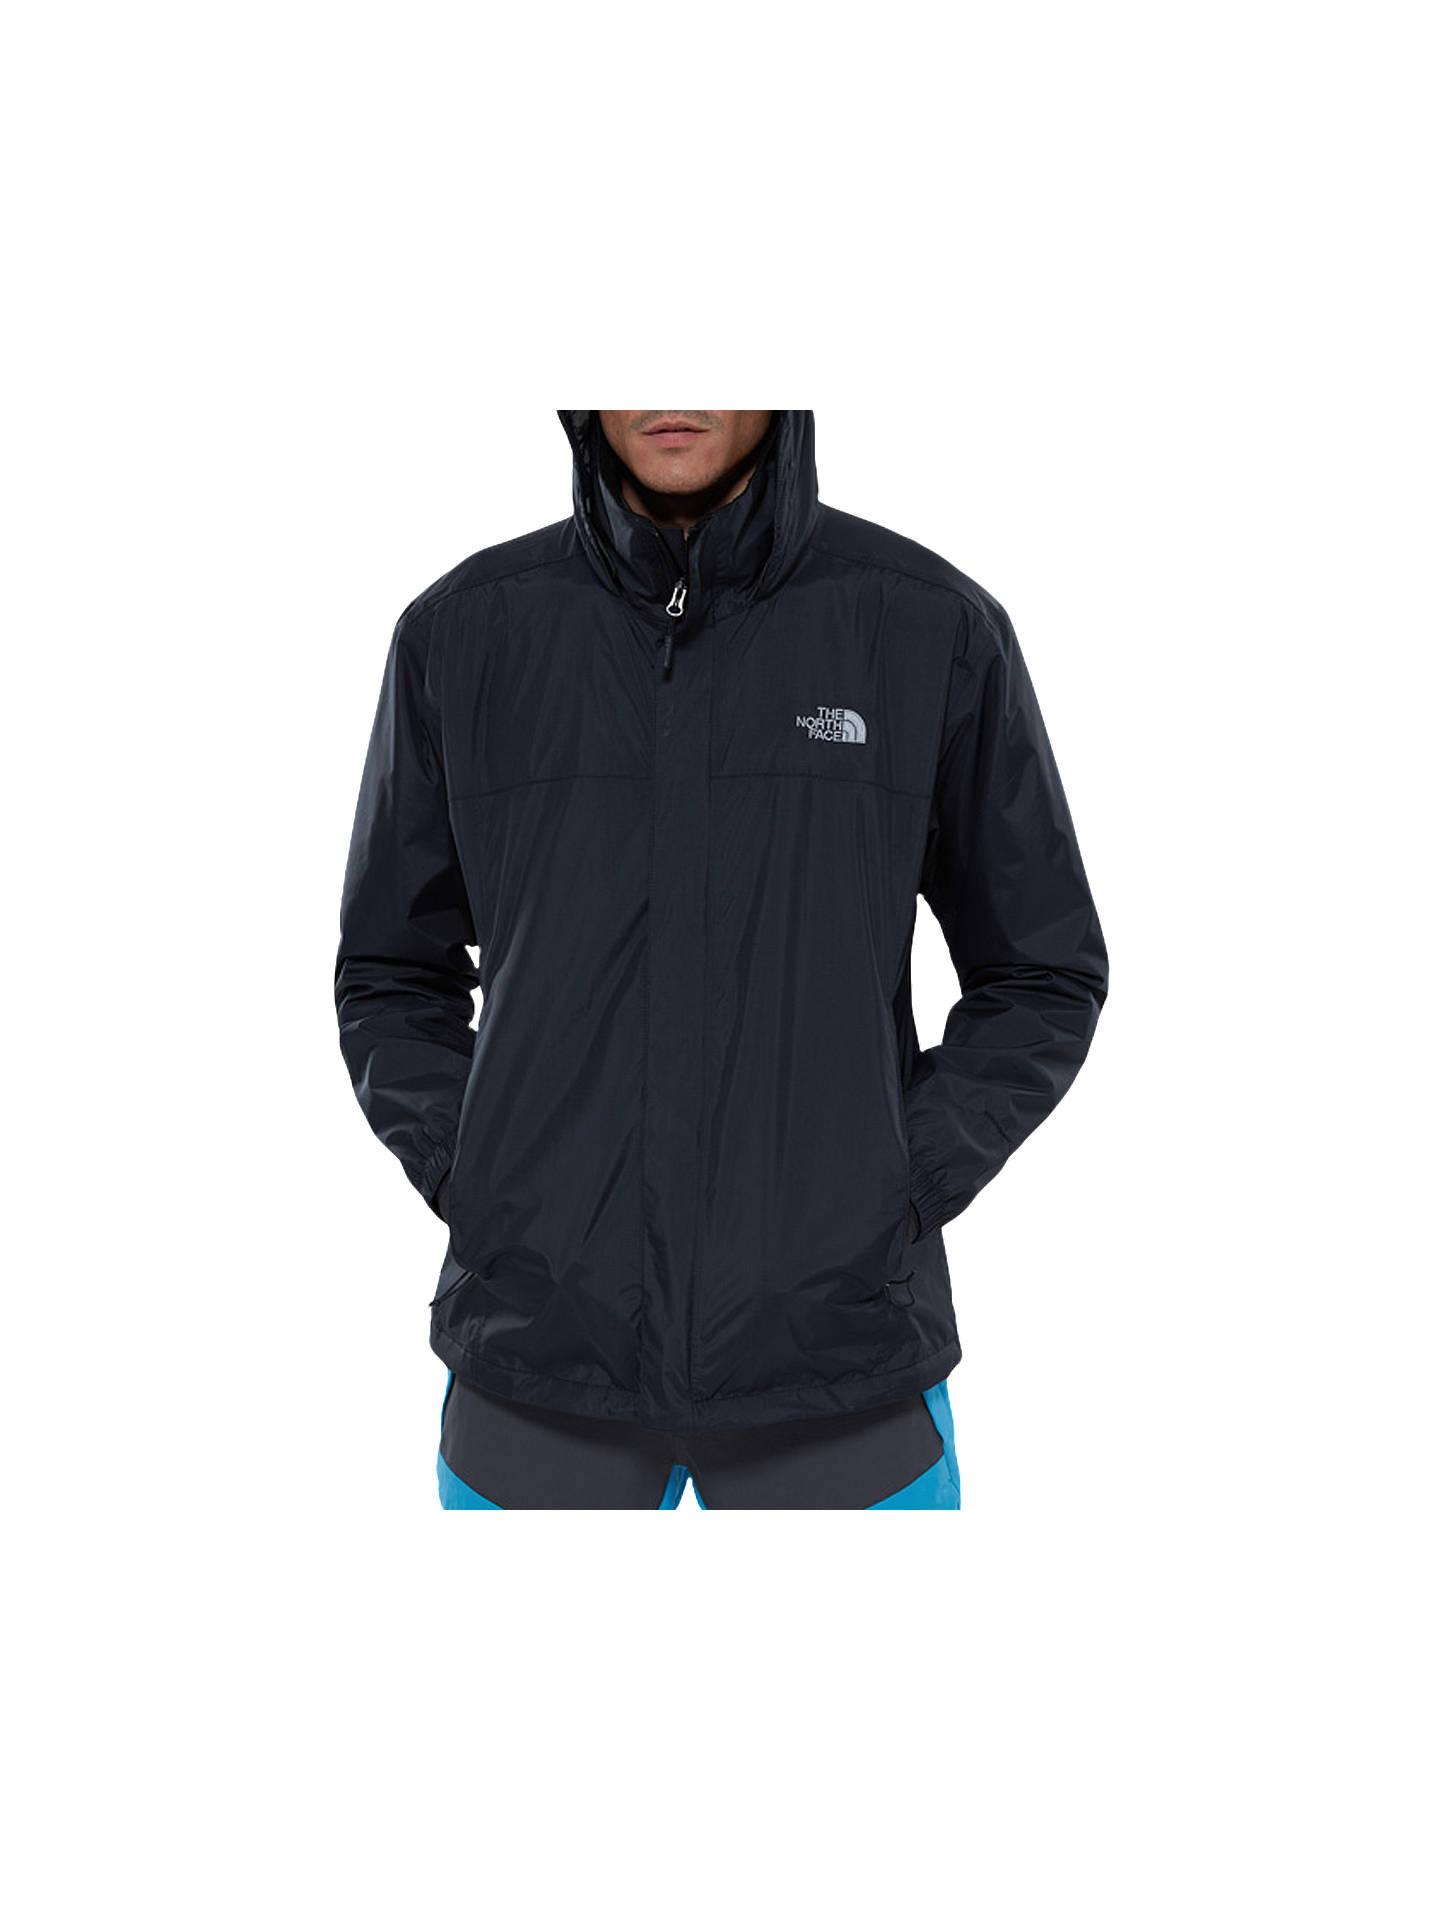 BuyThe North Face Resolve 2 Waterproof Men s Jacket b49f122c0